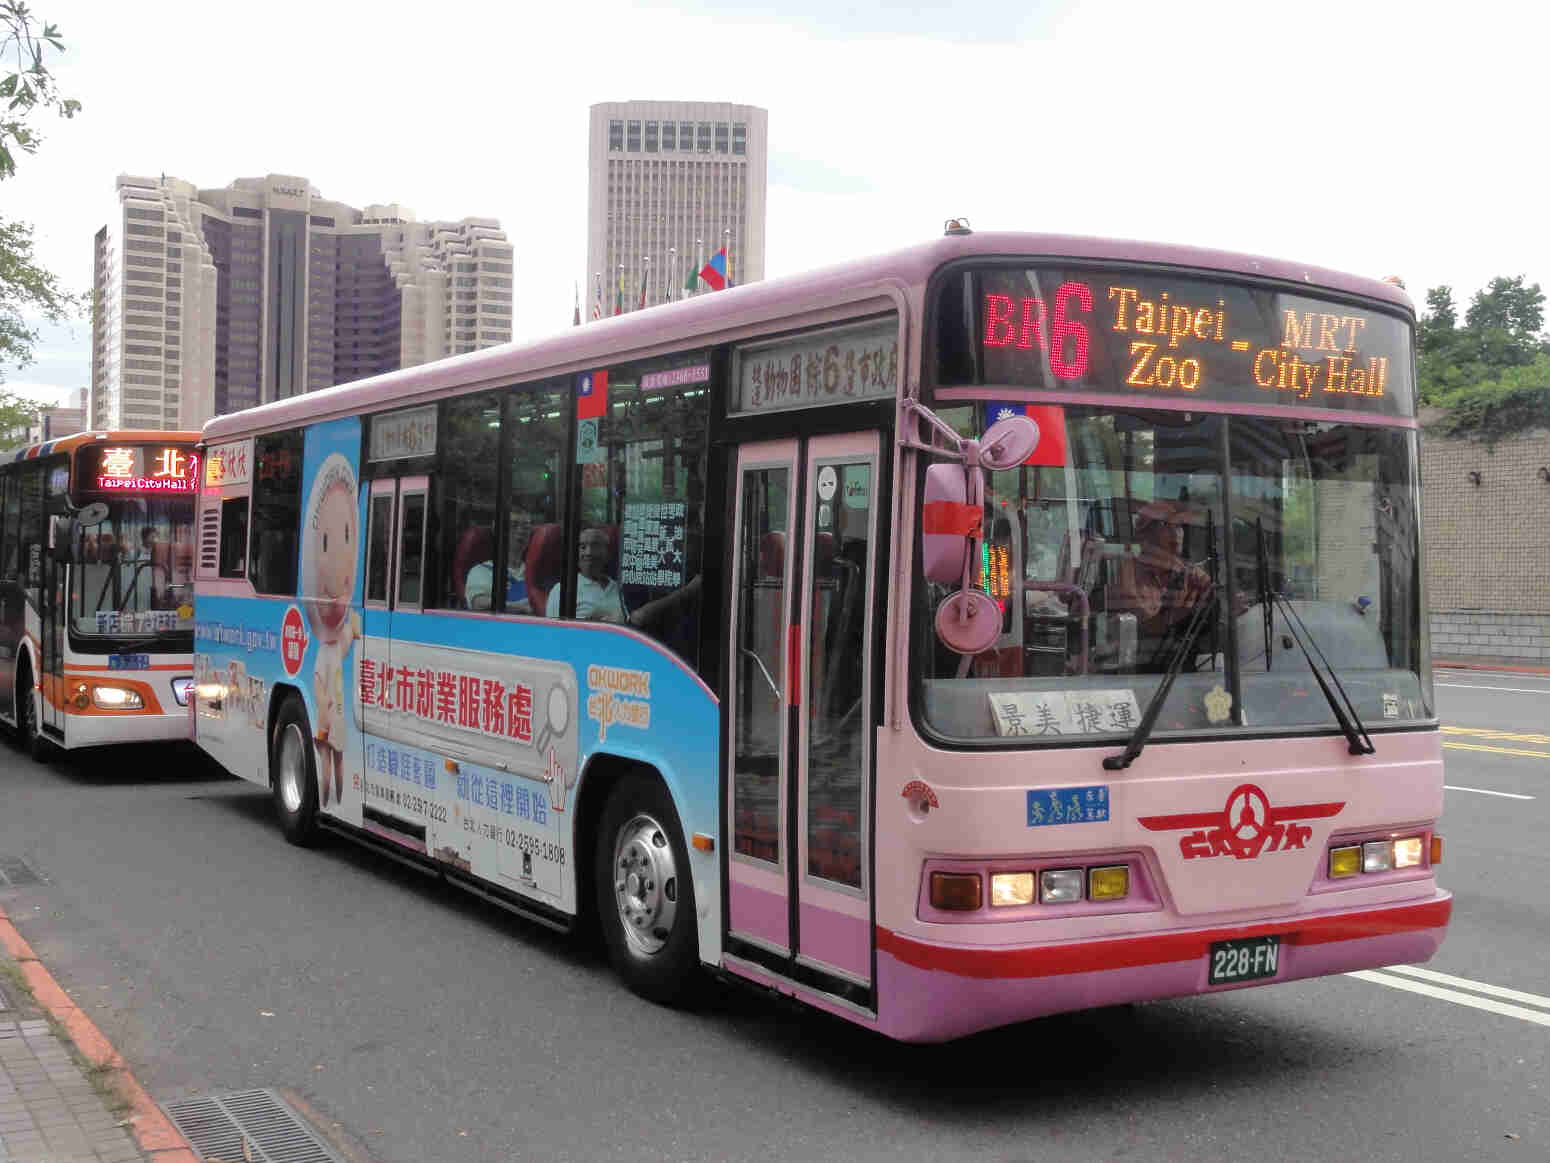 Buses in Taiwan